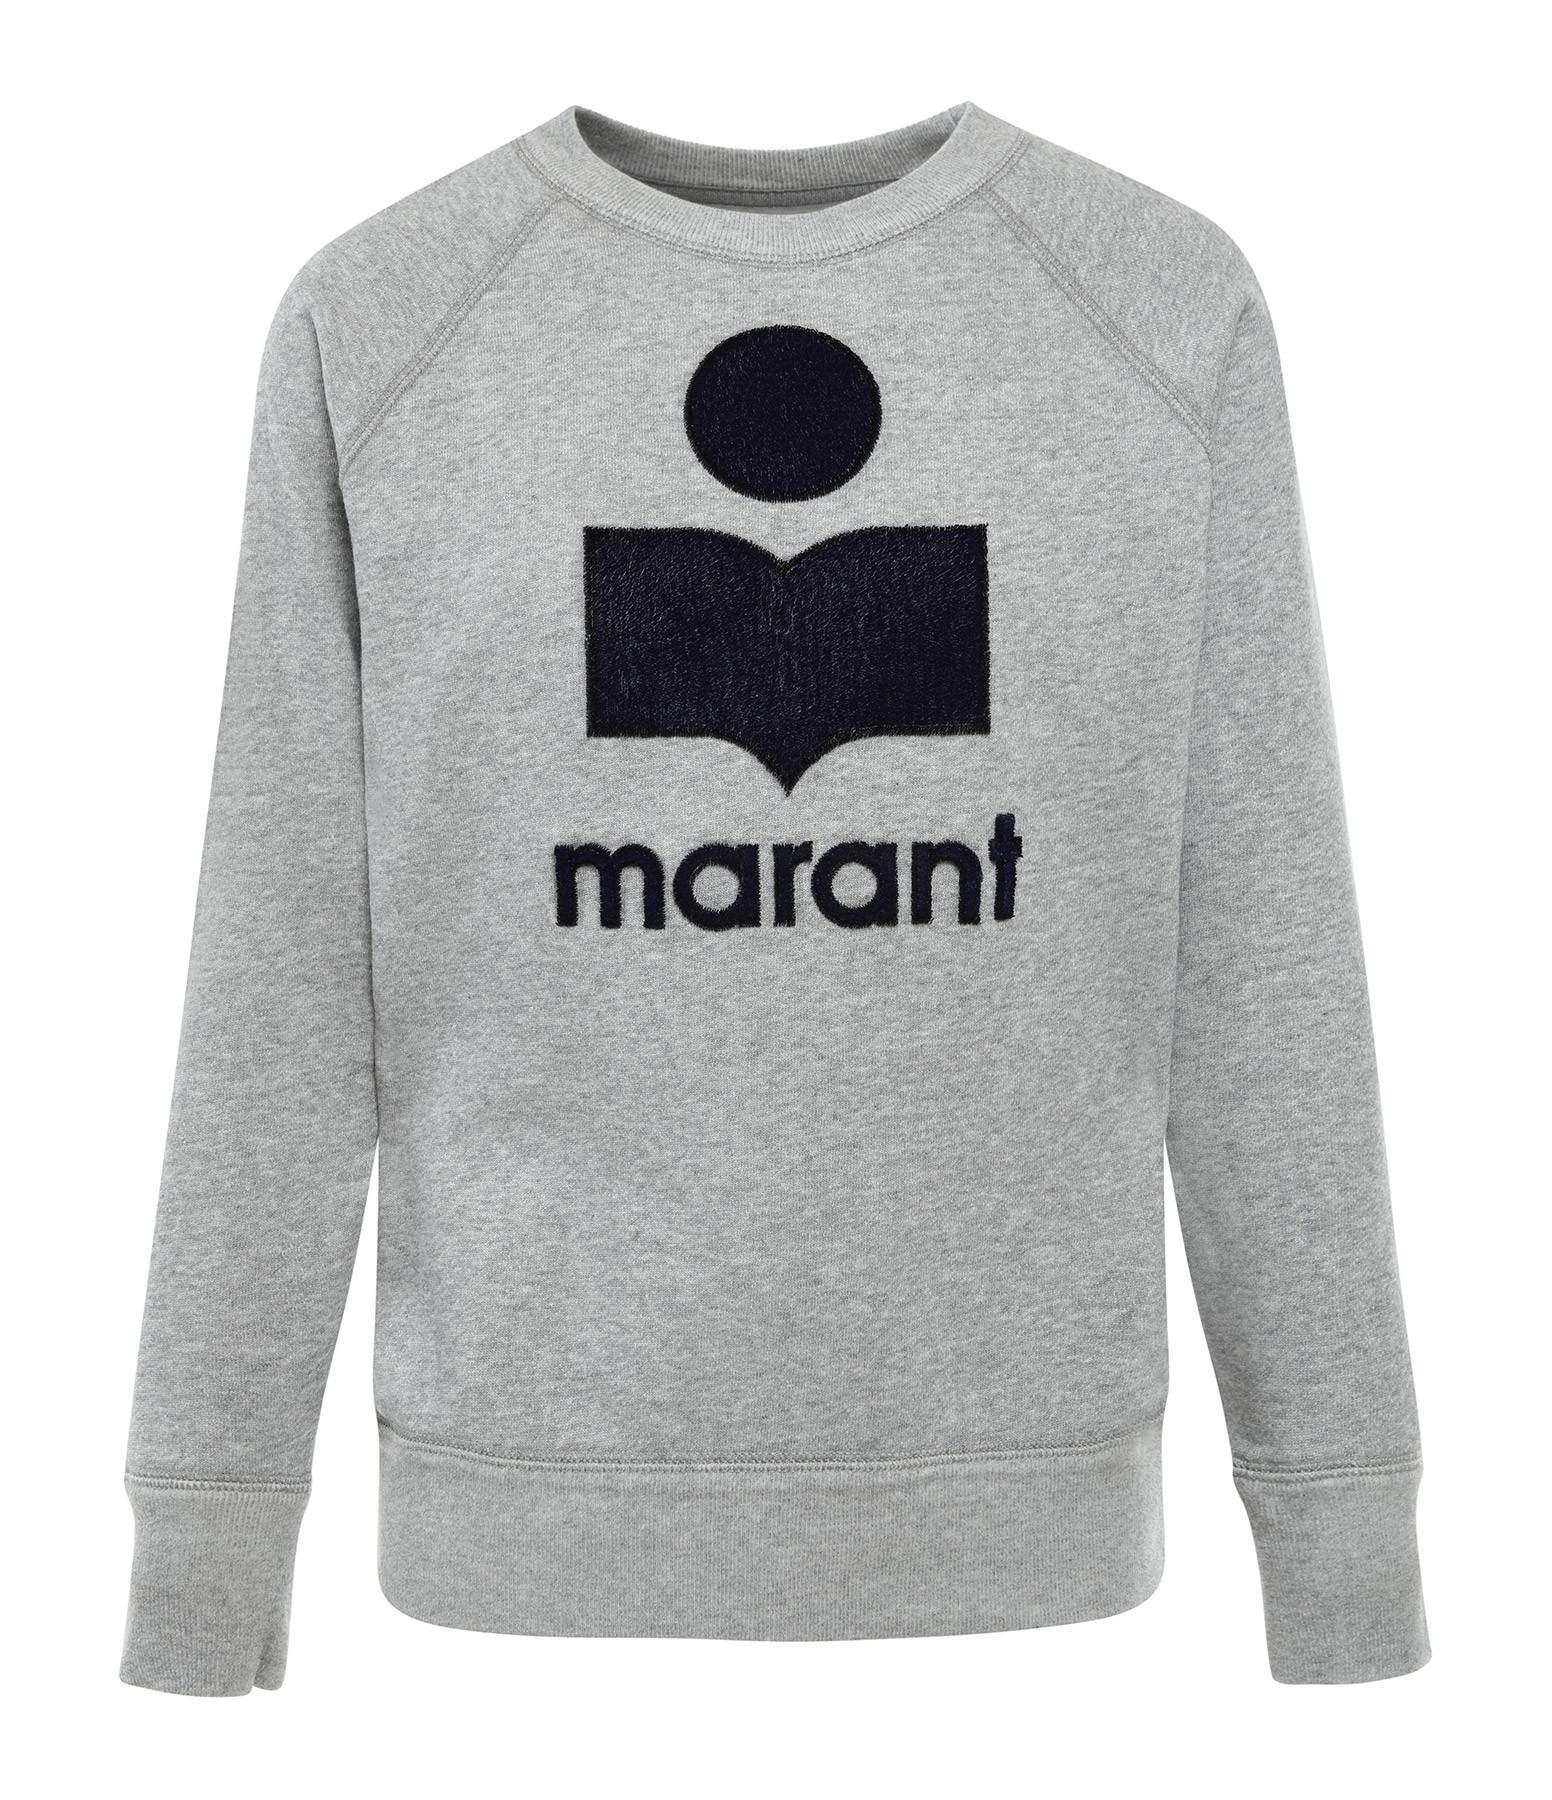 ISABEL MARANT ÉTOILE - Sweatshirt Milly Coton Gris